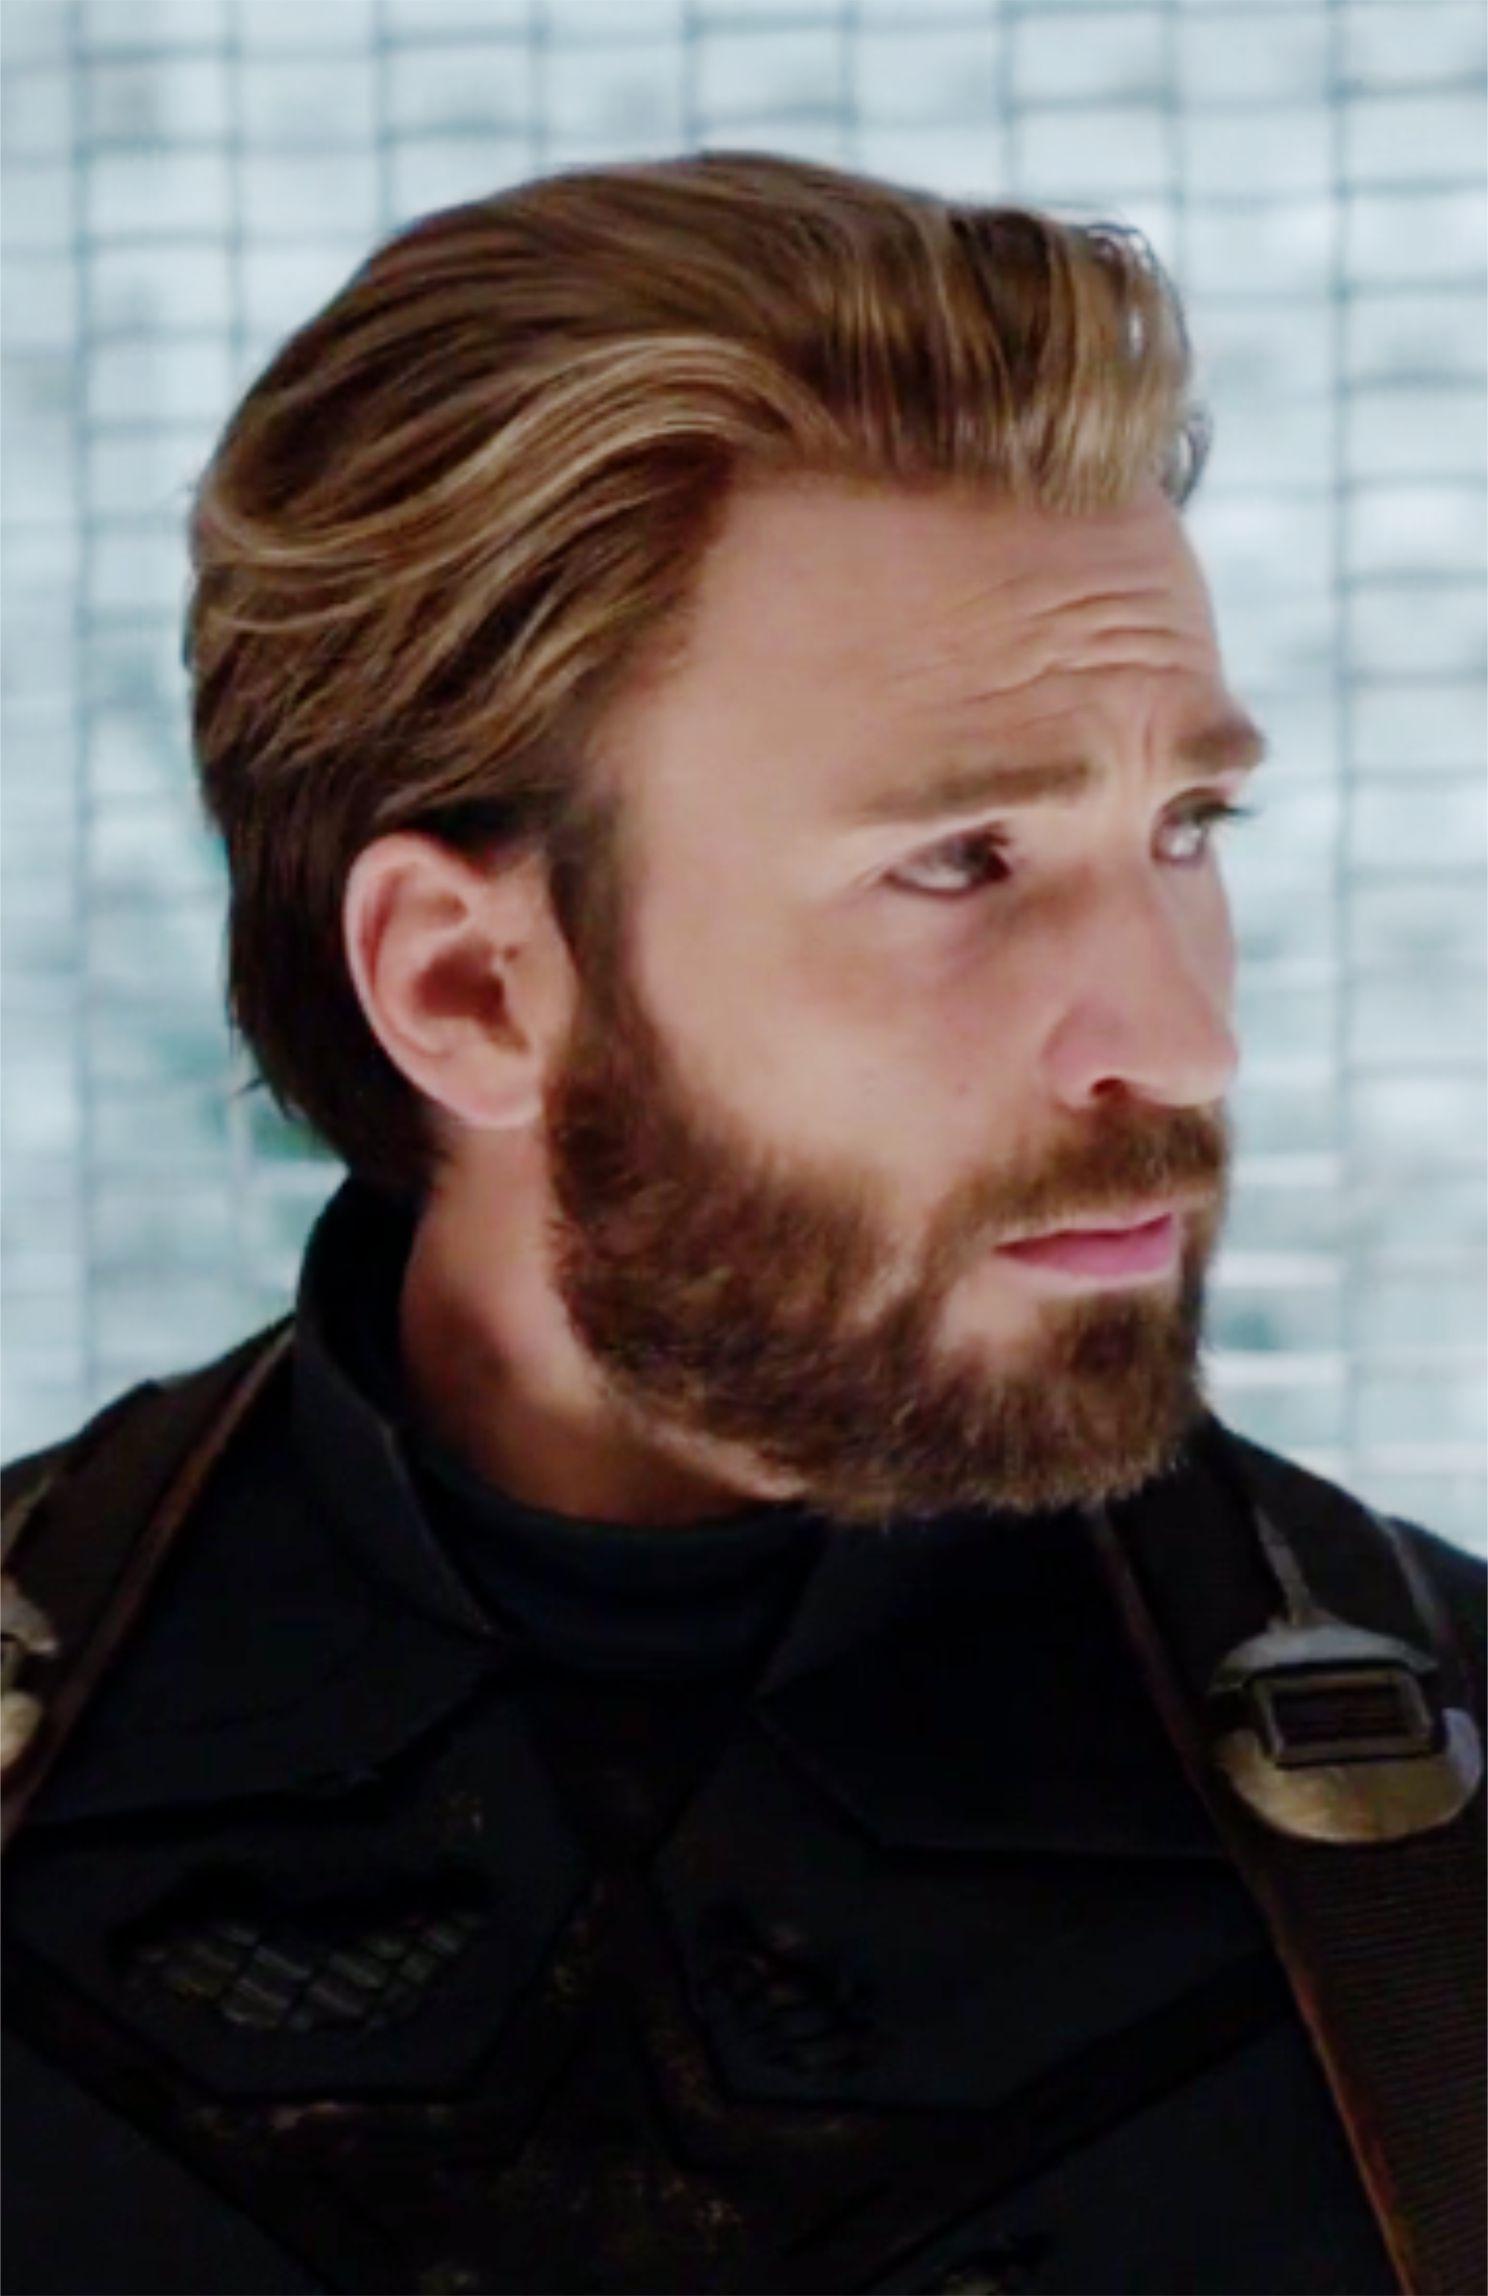 Captain America - Infinity War  Chris evans haircut, Chris evans